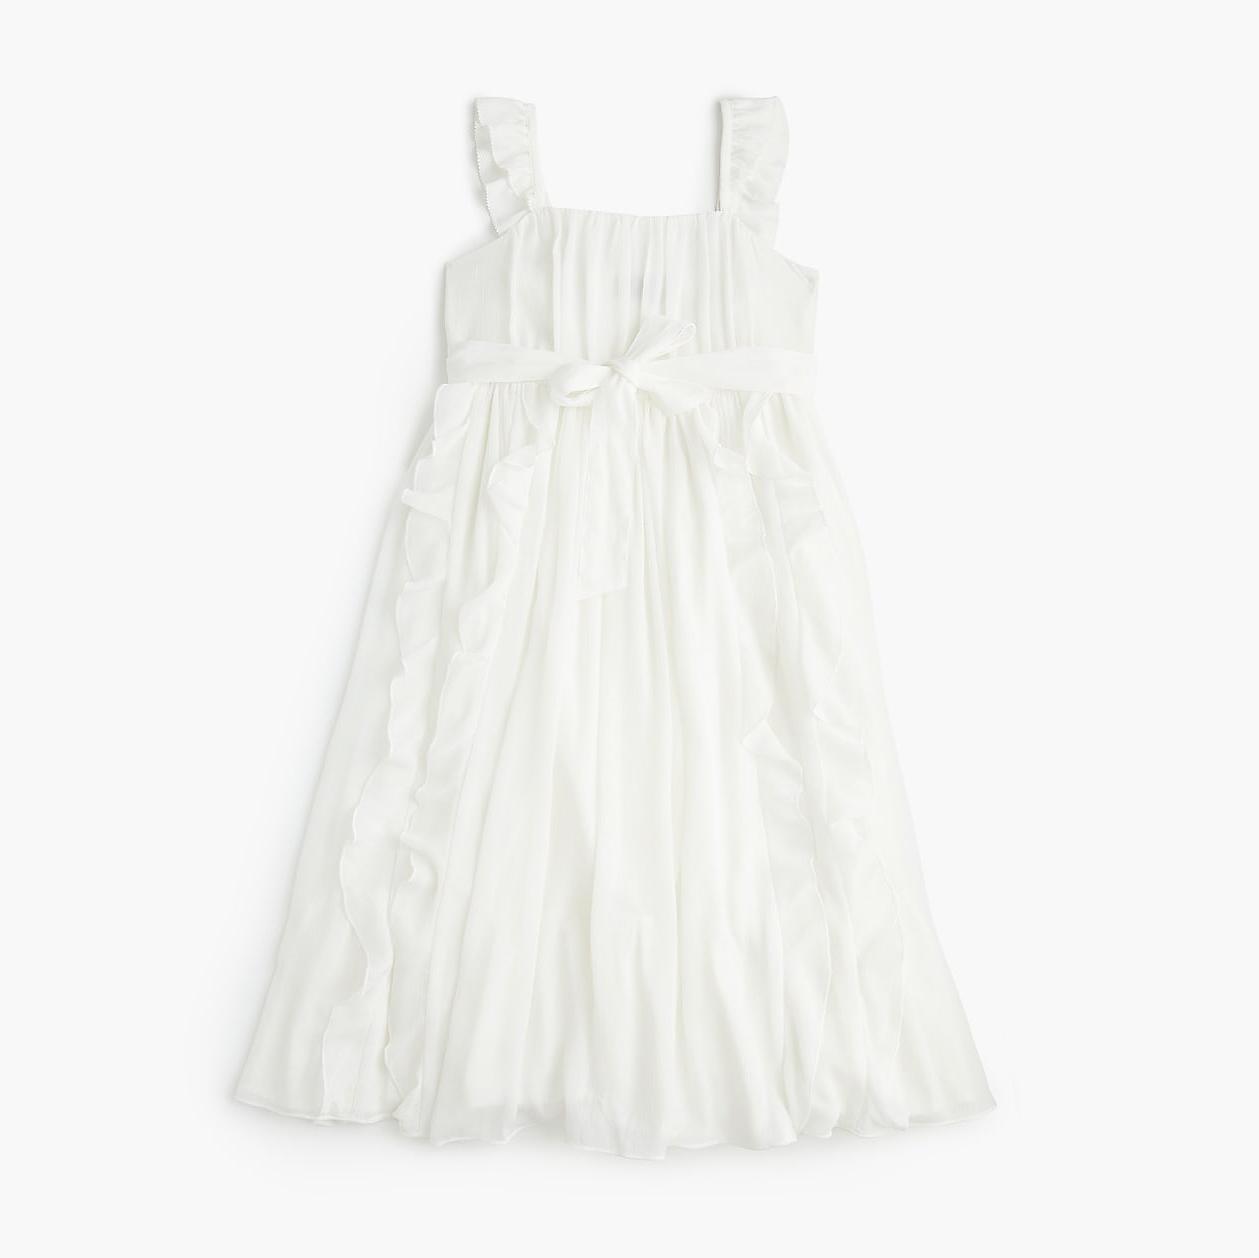 summer flower girl outfit white bow dress